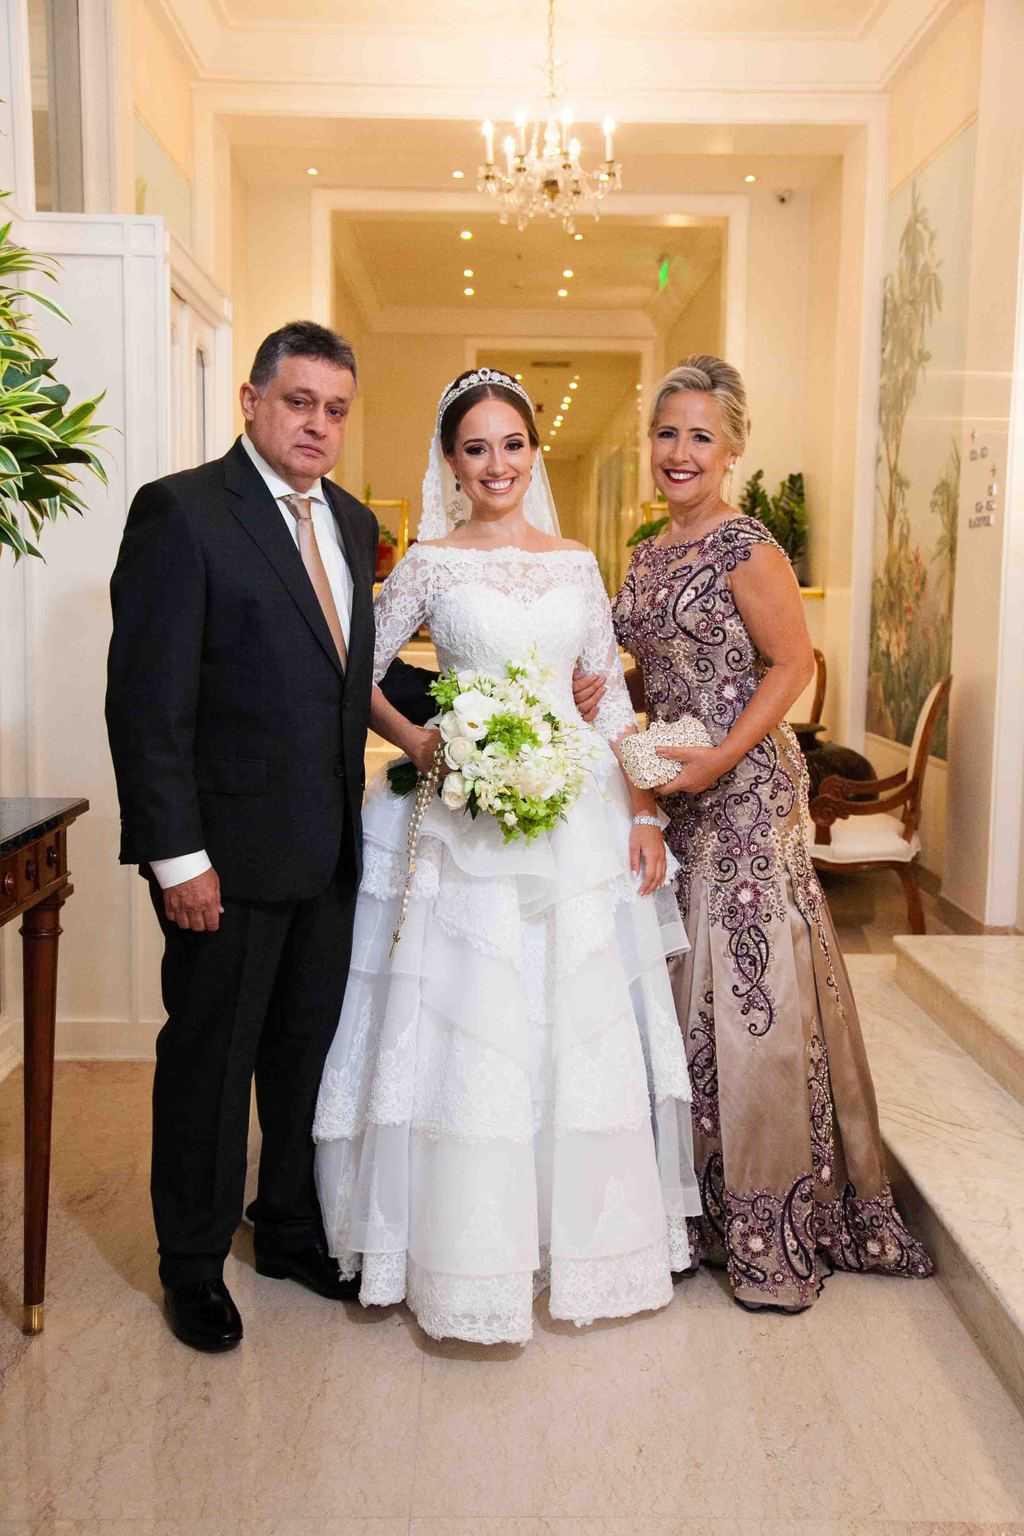 Casamento-Clássico-Casamento-tradicional-Copacabana-Palace-Família-Monica-Roias-Ribas-Foto-e-Vídeo-Tuanny-e-Bernardo-CaseMe